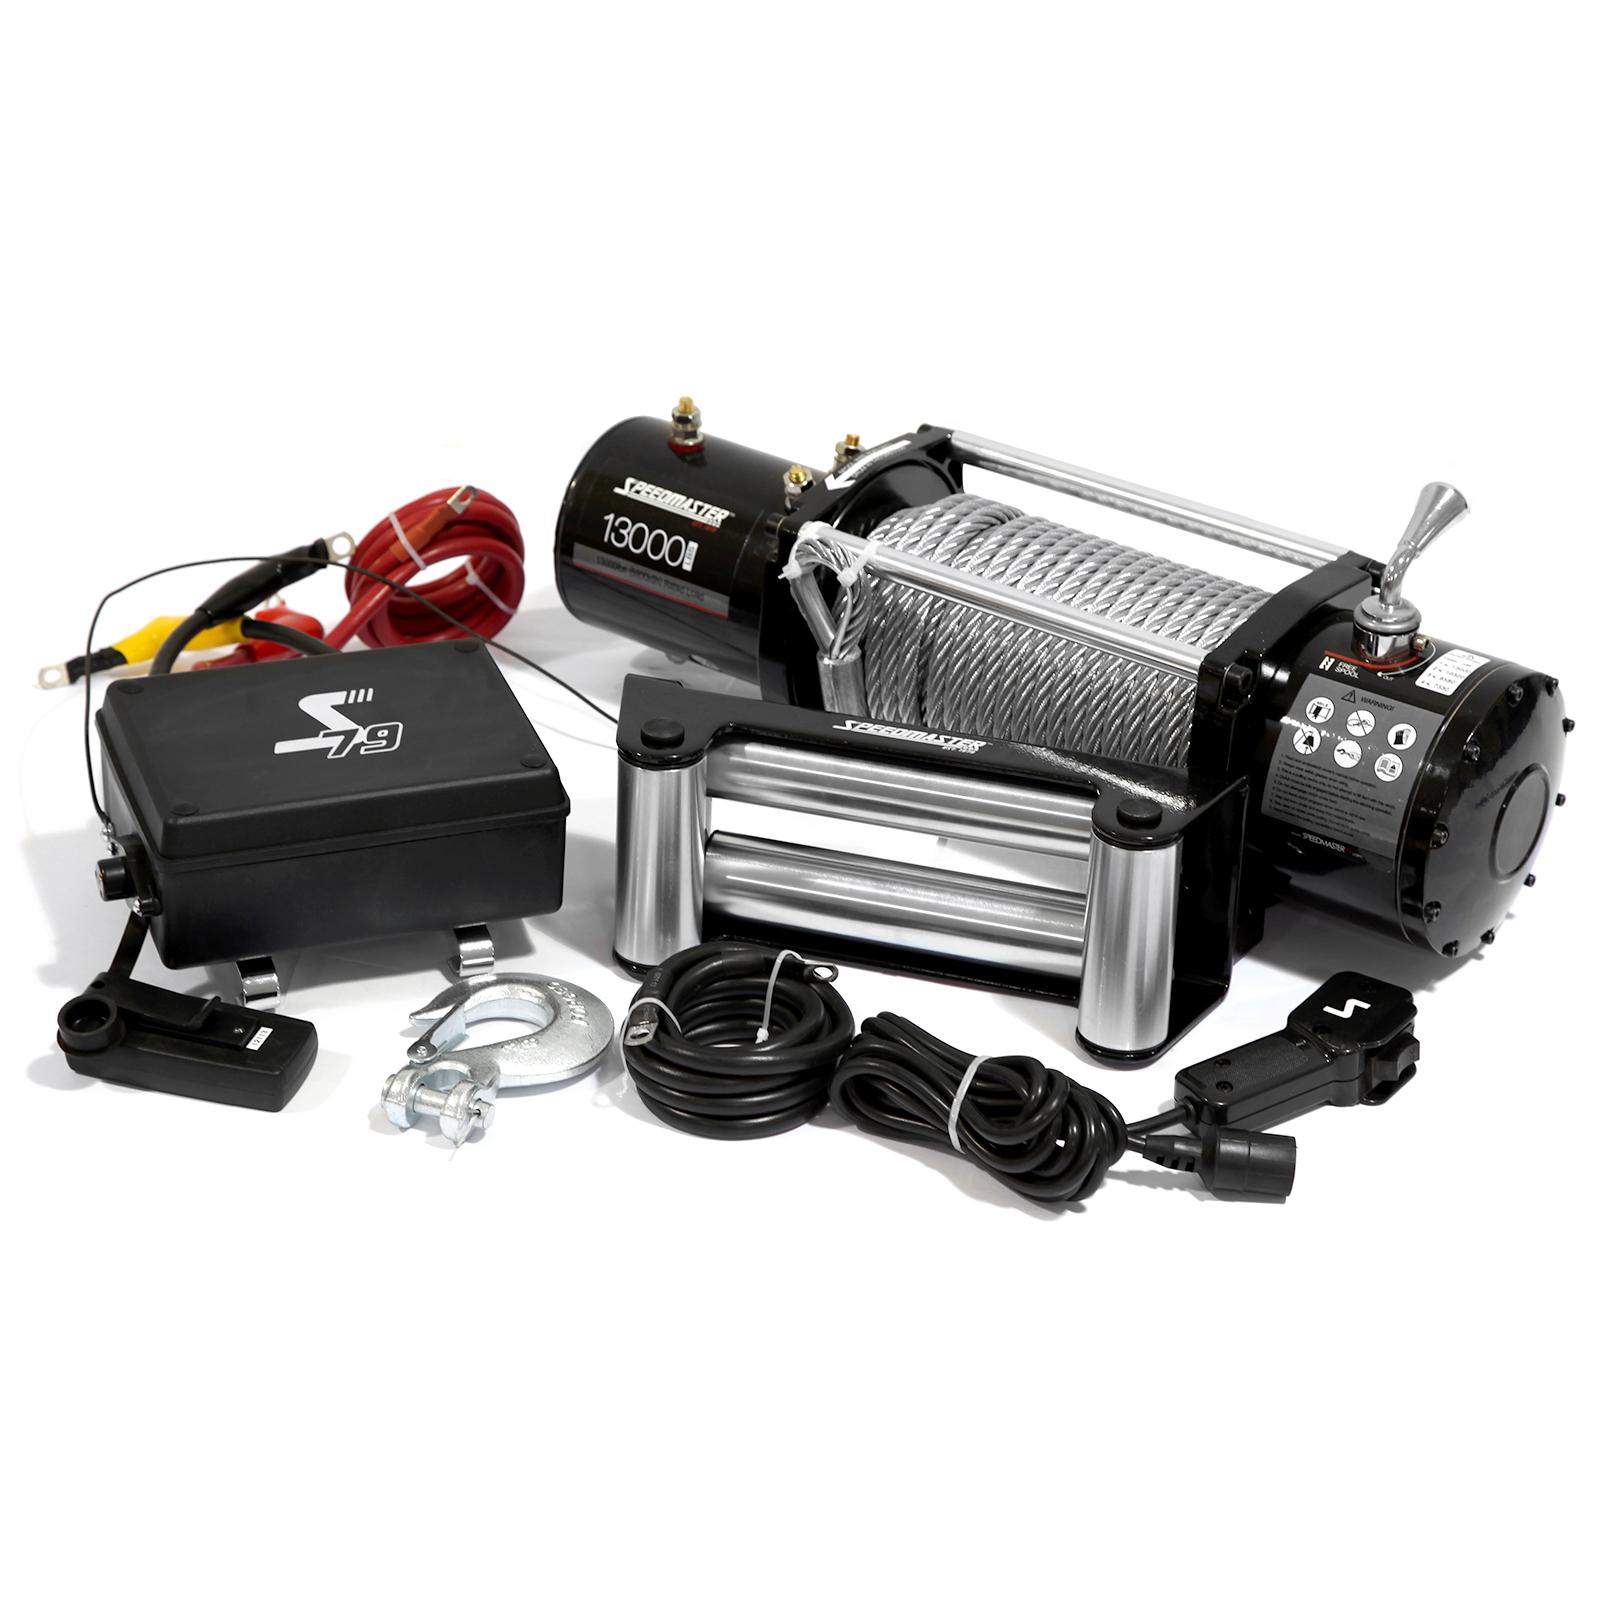 13000lbs / 5900kgs 12V Electric 4wd Winch Kit w/ Wireless Remote